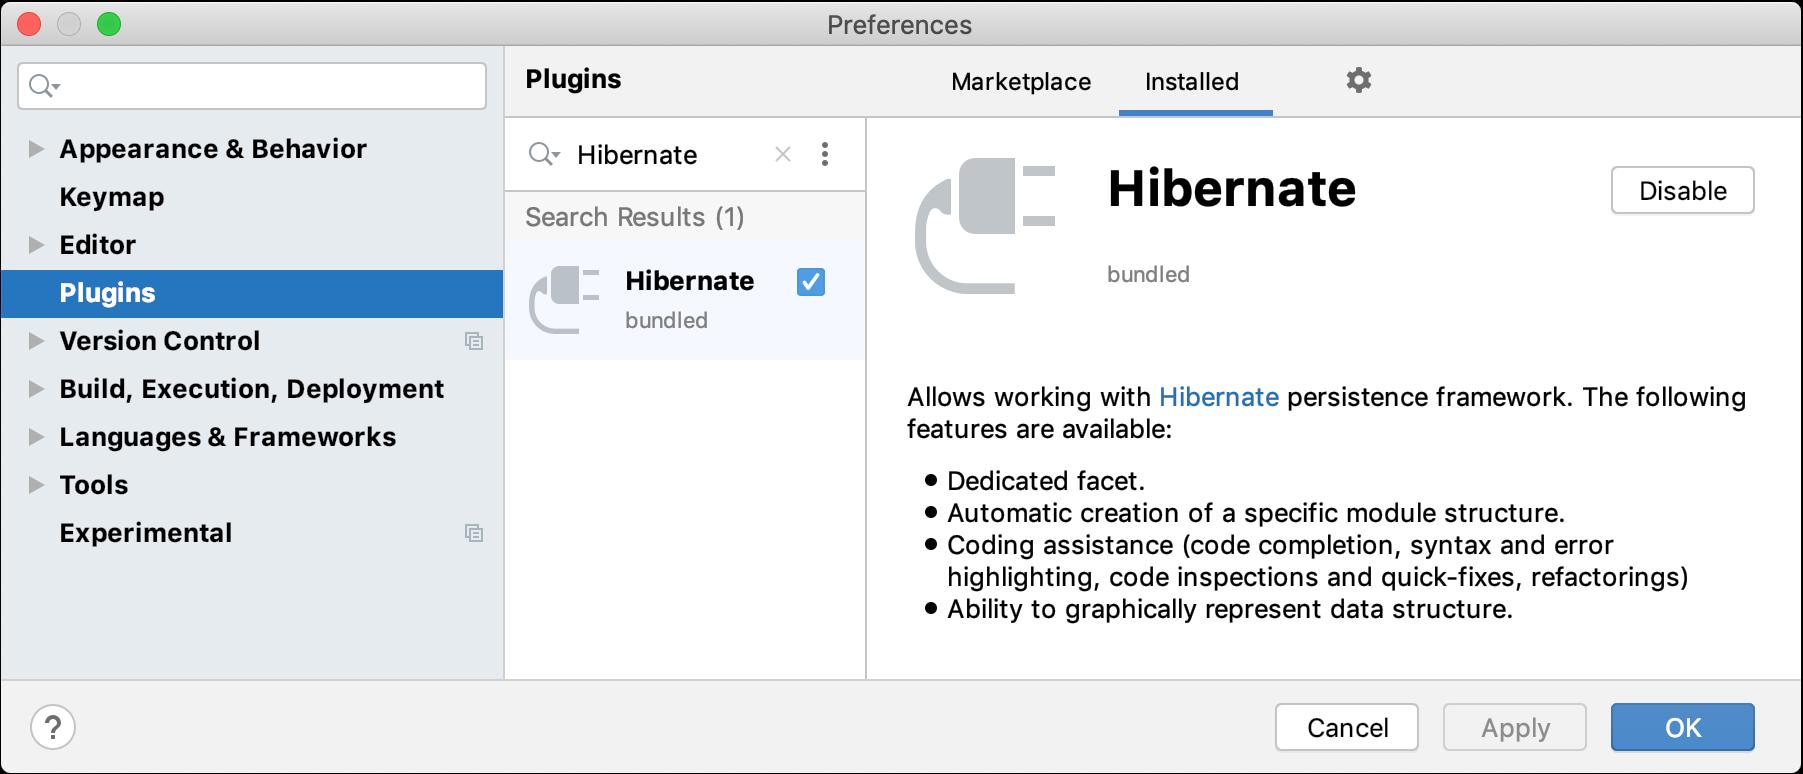 Enabling the Hibernate plugin